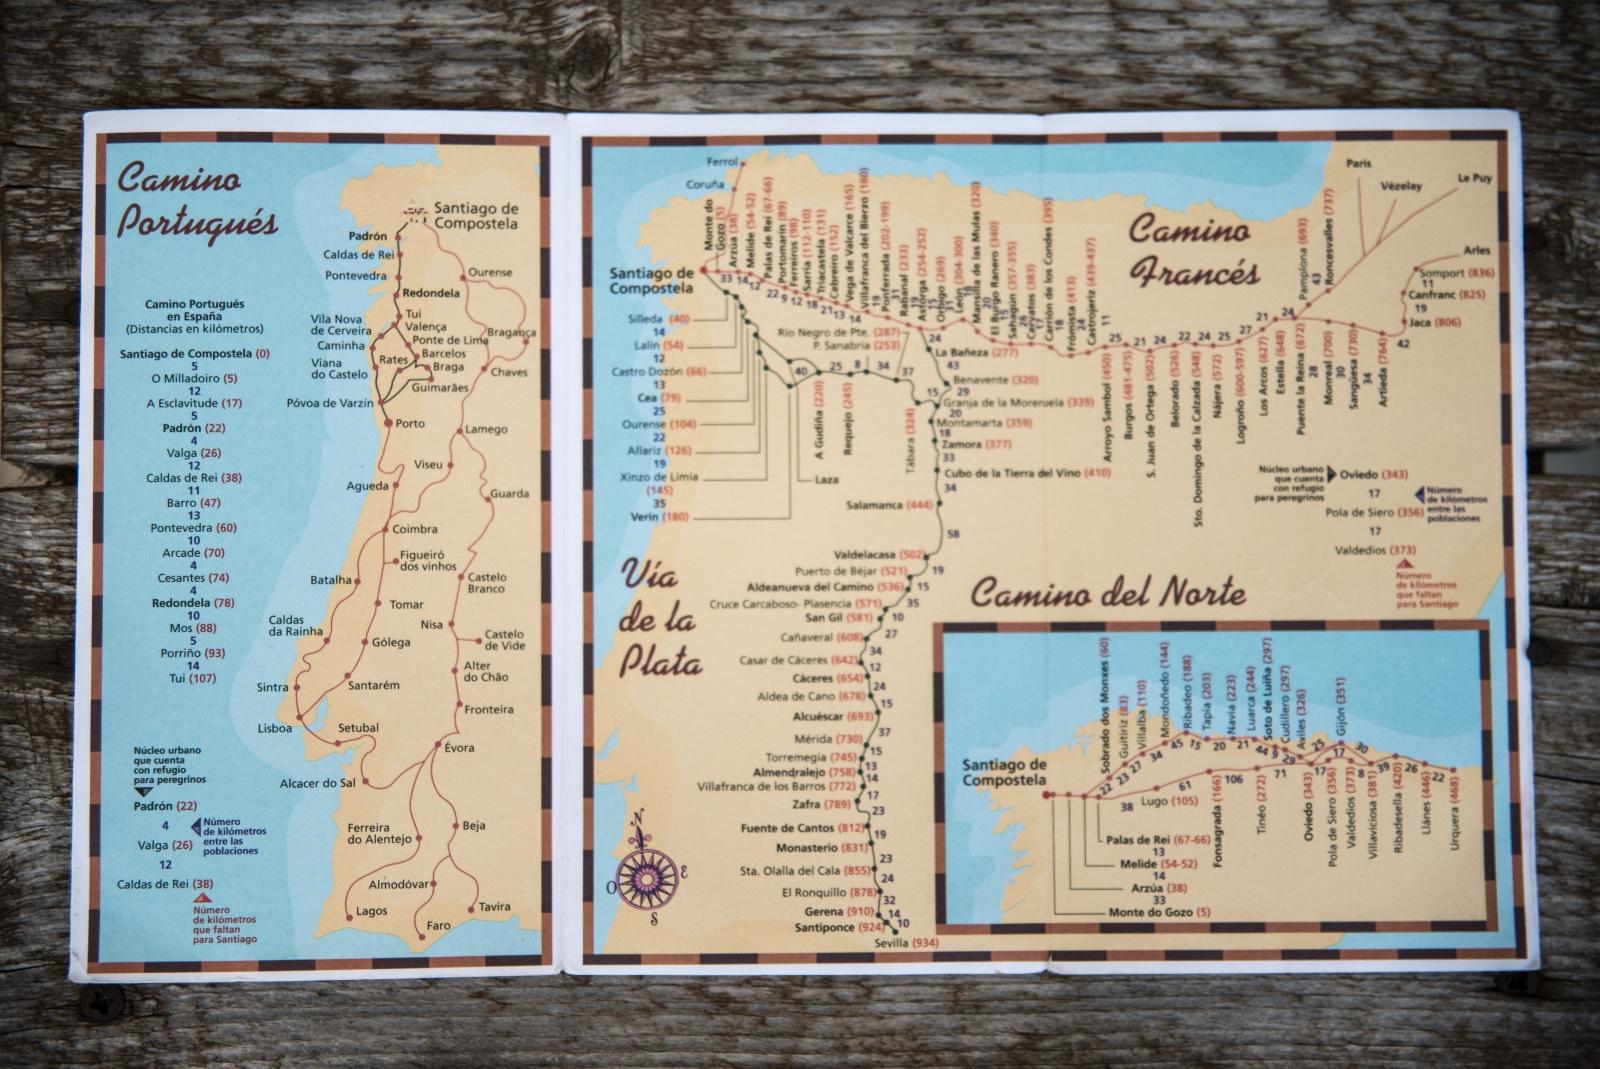 Annalisa Melas - Verso Santiago De Compostela - 2 - Una cartina semplice e precisa delle varie vie che portano a Santiago